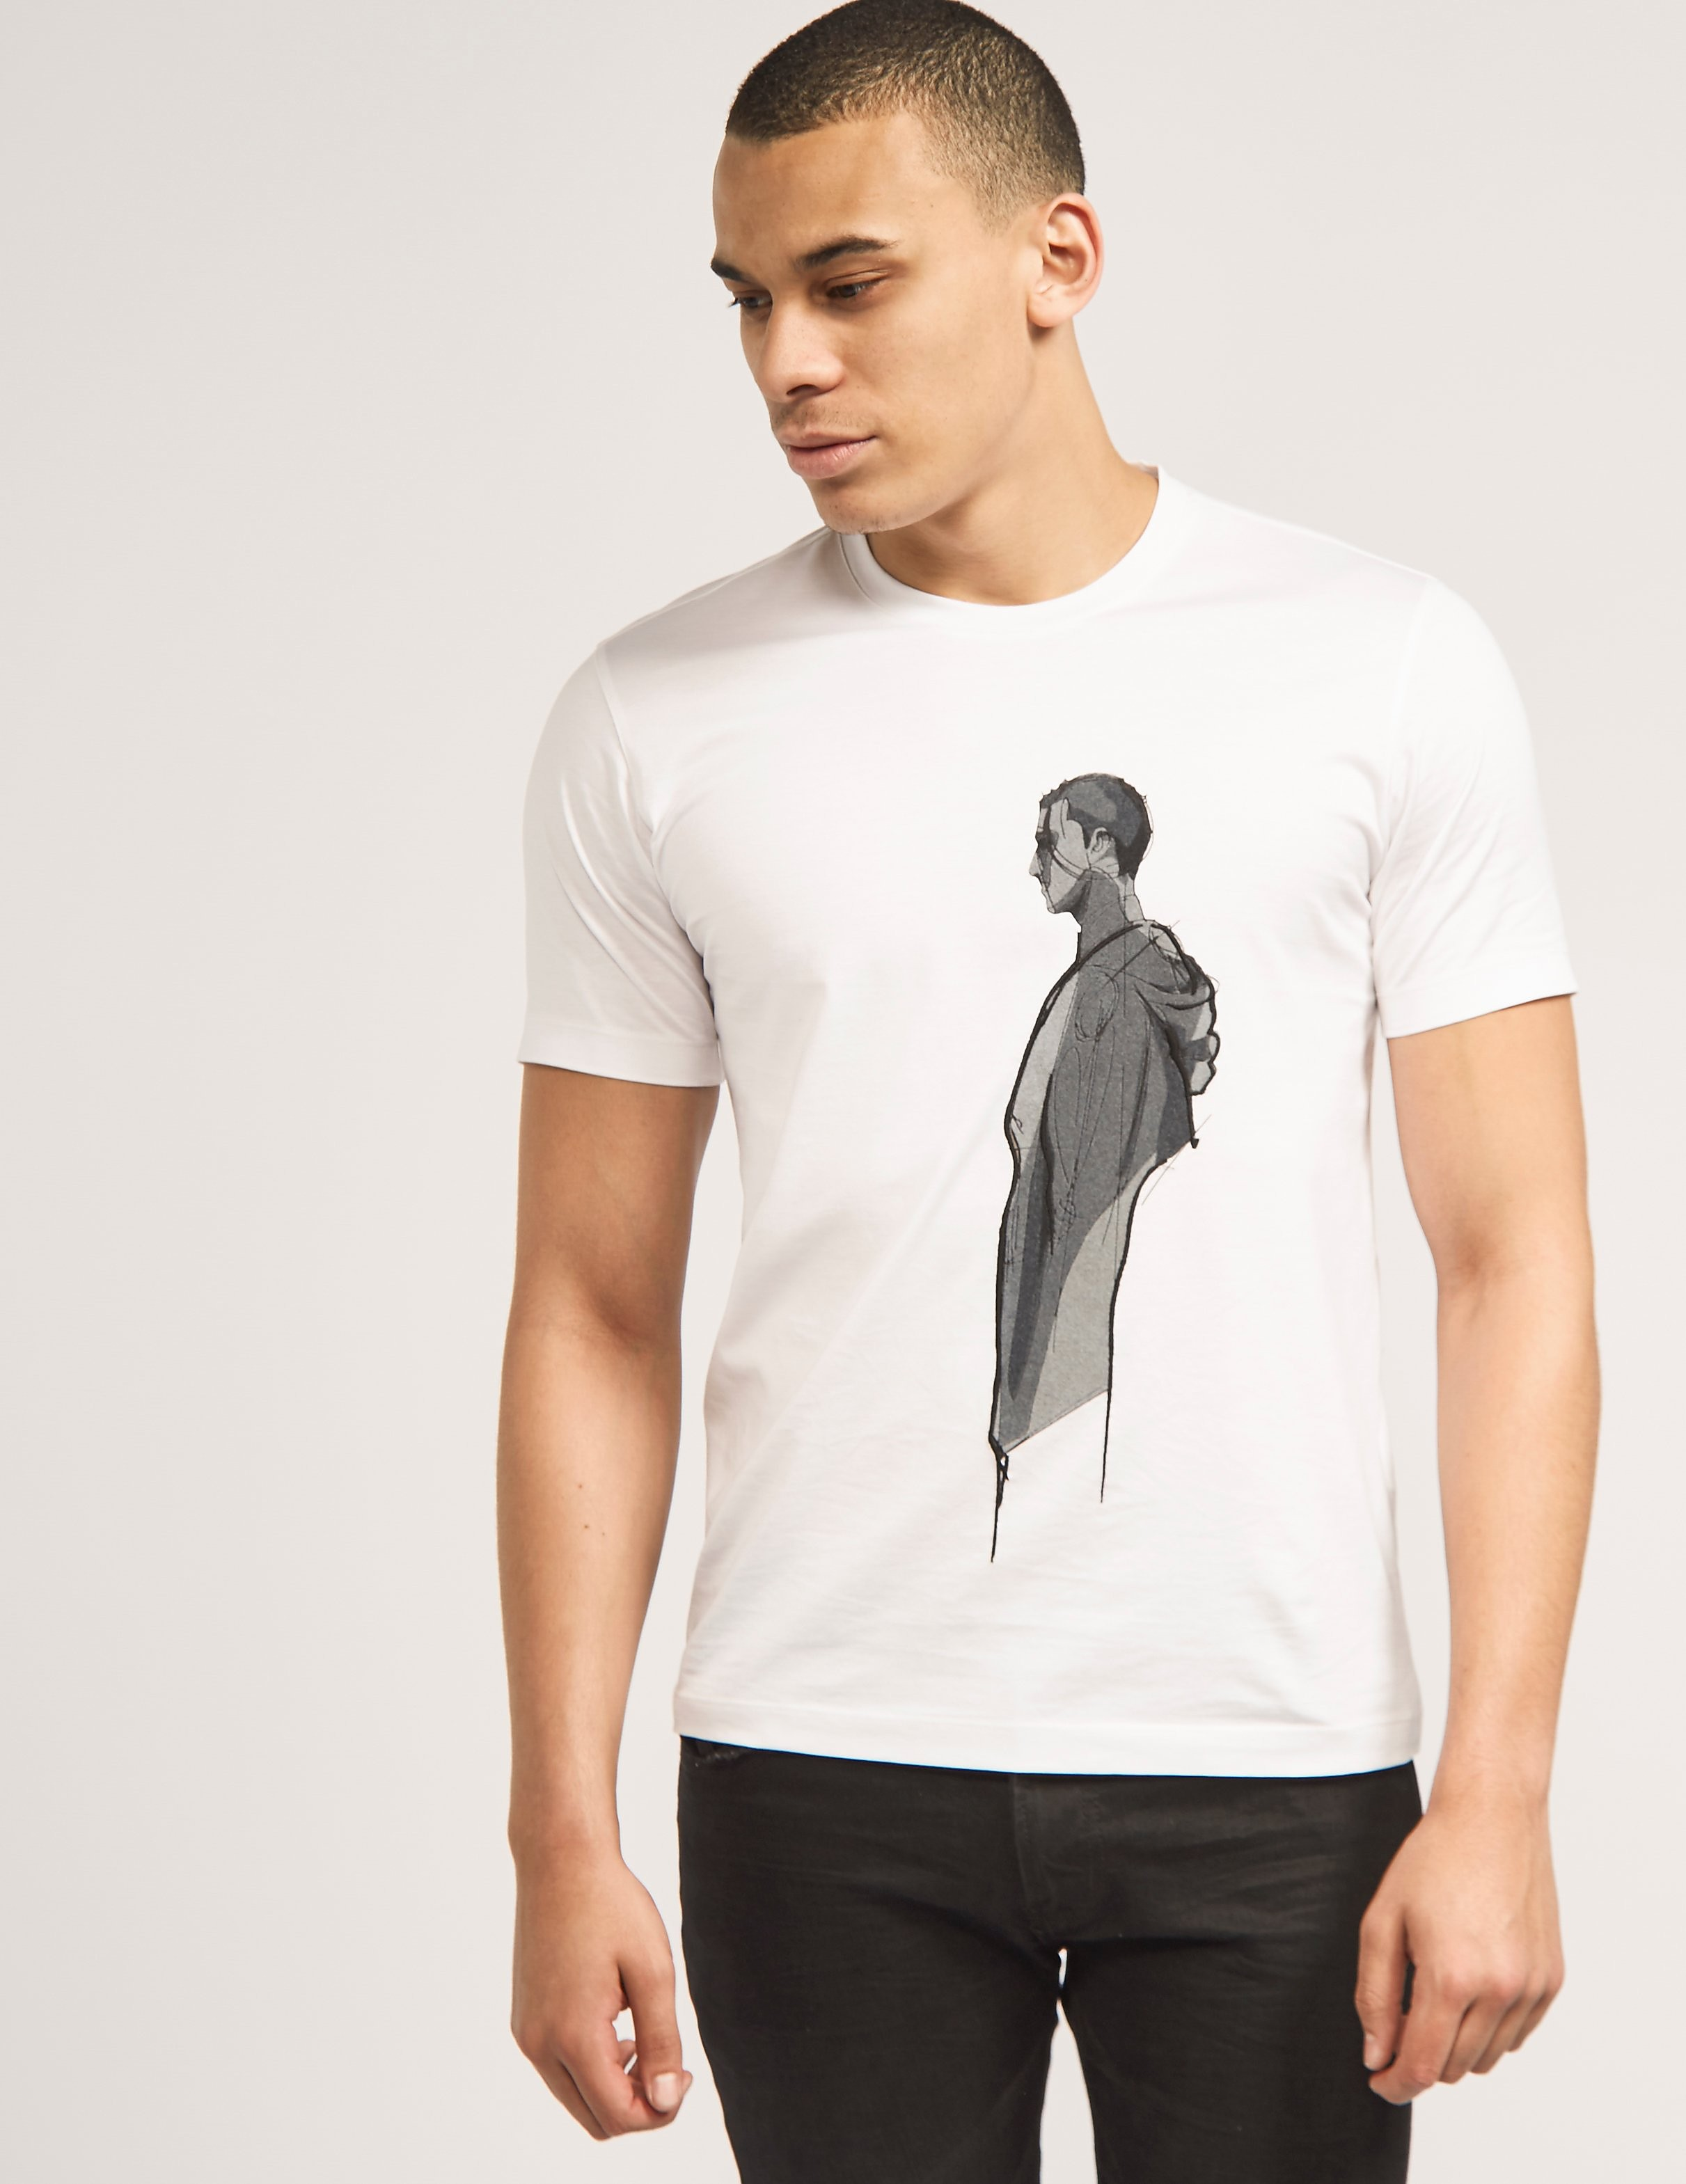 Z Zegna Man Print T-Shirt